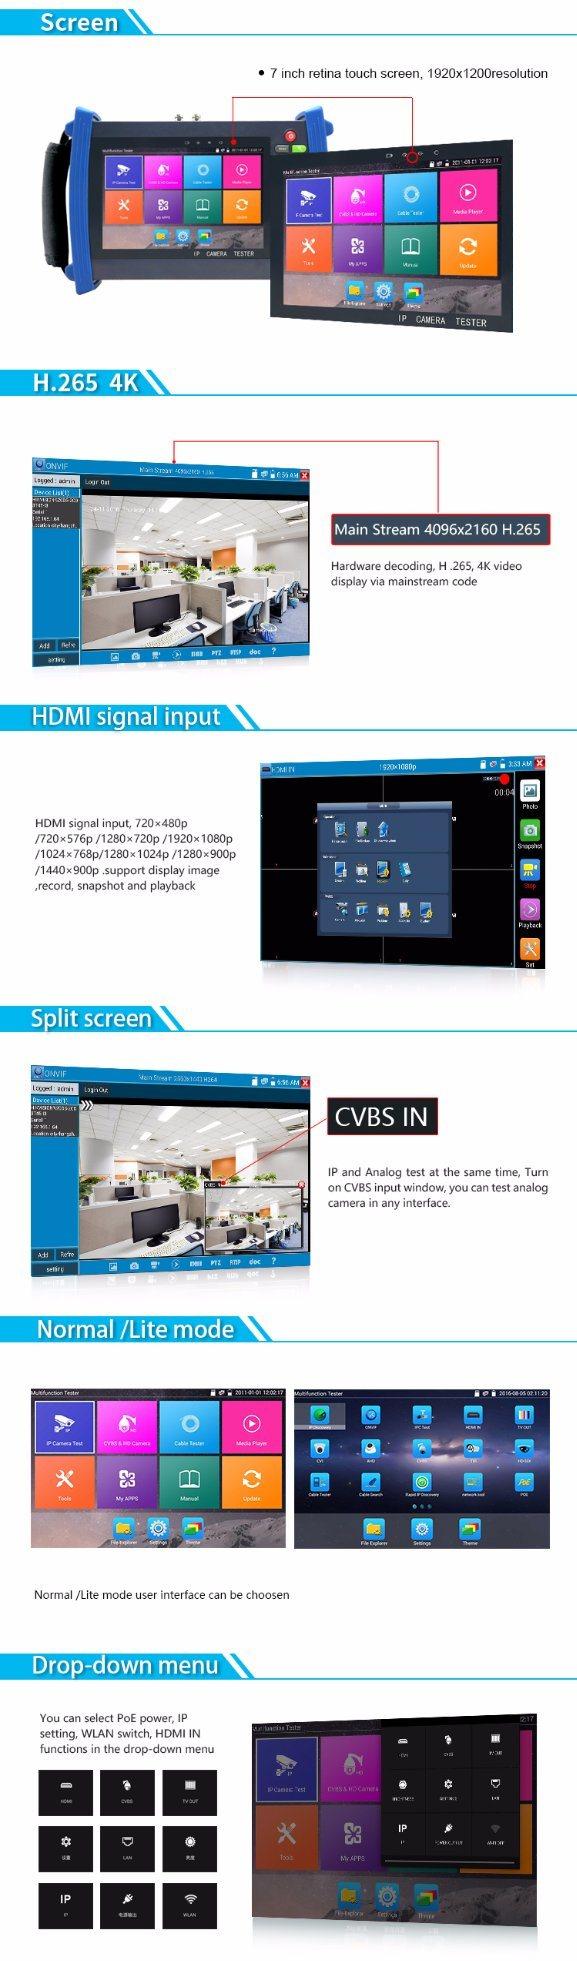 7 Lcd Portable Cctv Video Test Monitor For Ipc Ahd Hd Tvi Cvi Ip Camera Tester Inch Ipcahdhd Tvicvisdi Security Multi Function